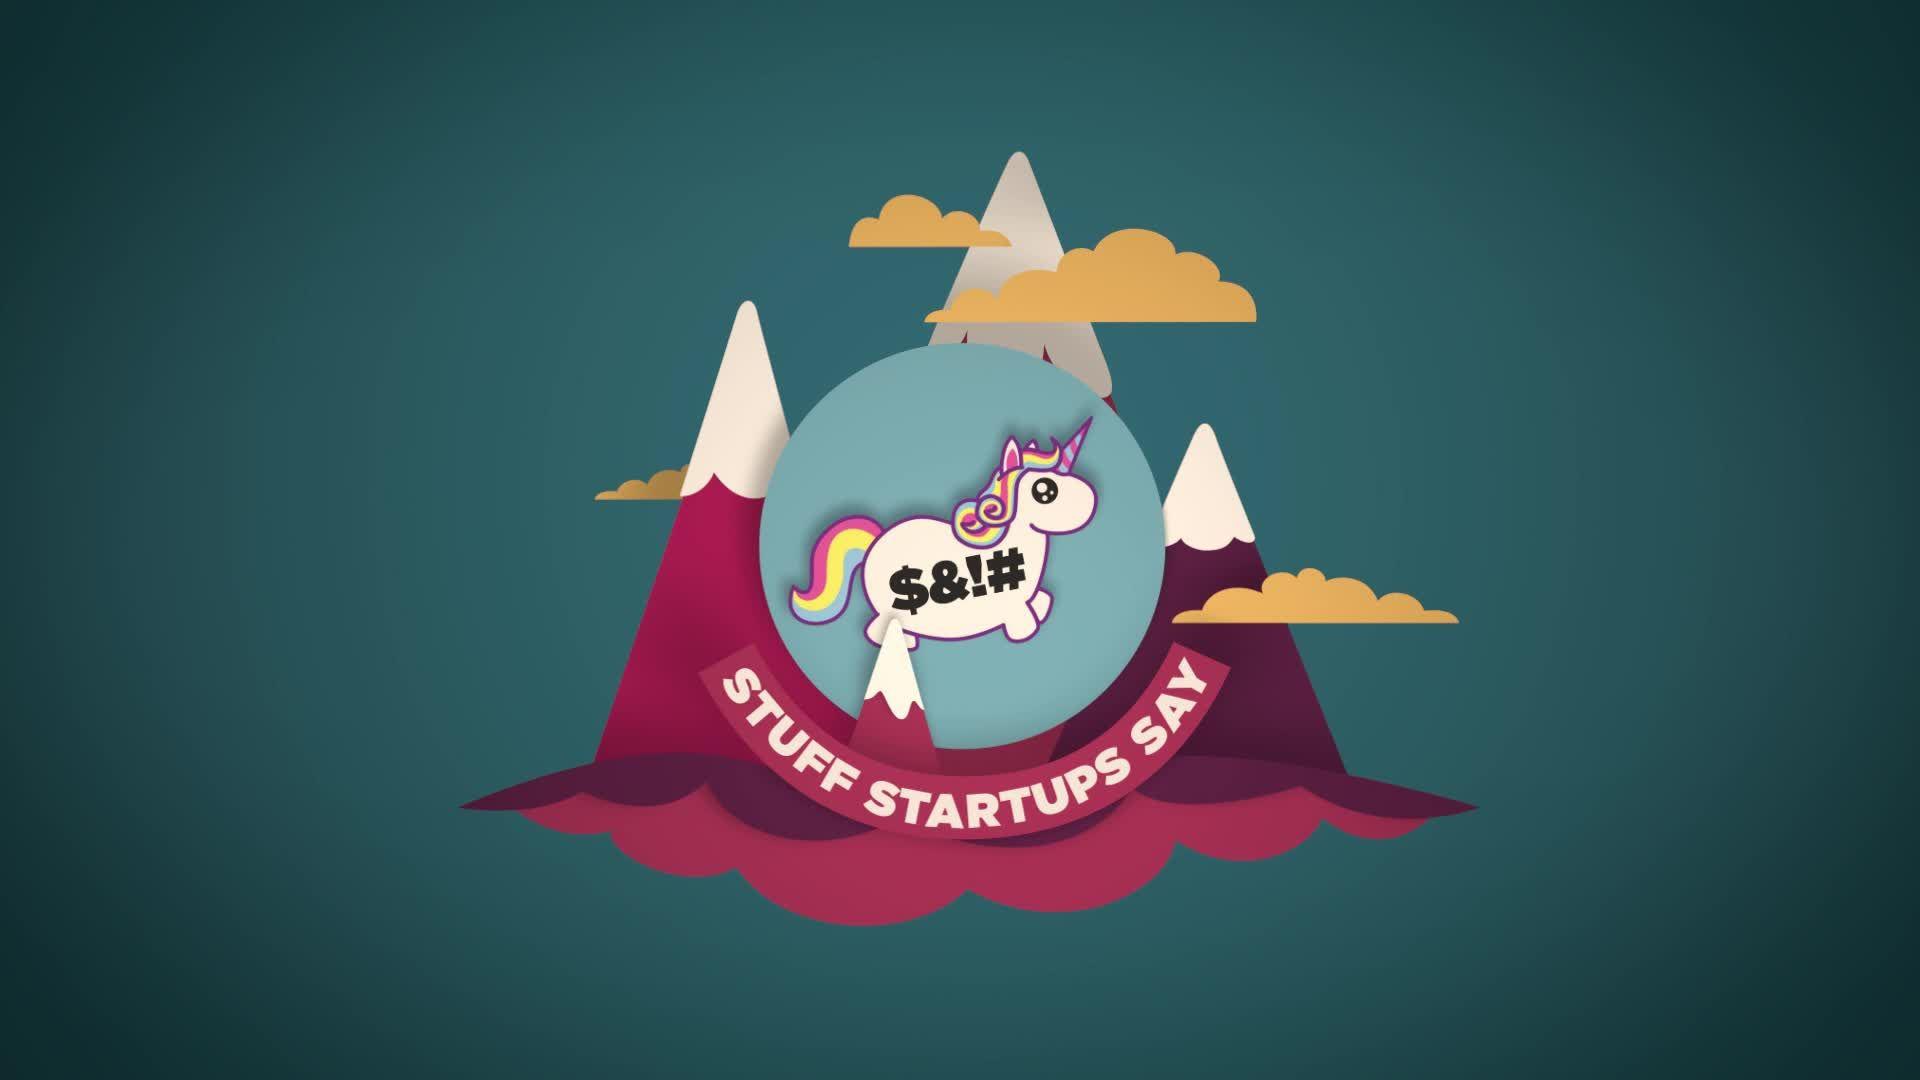 TECH TRUTH: Stuff Entrepreneurs Say